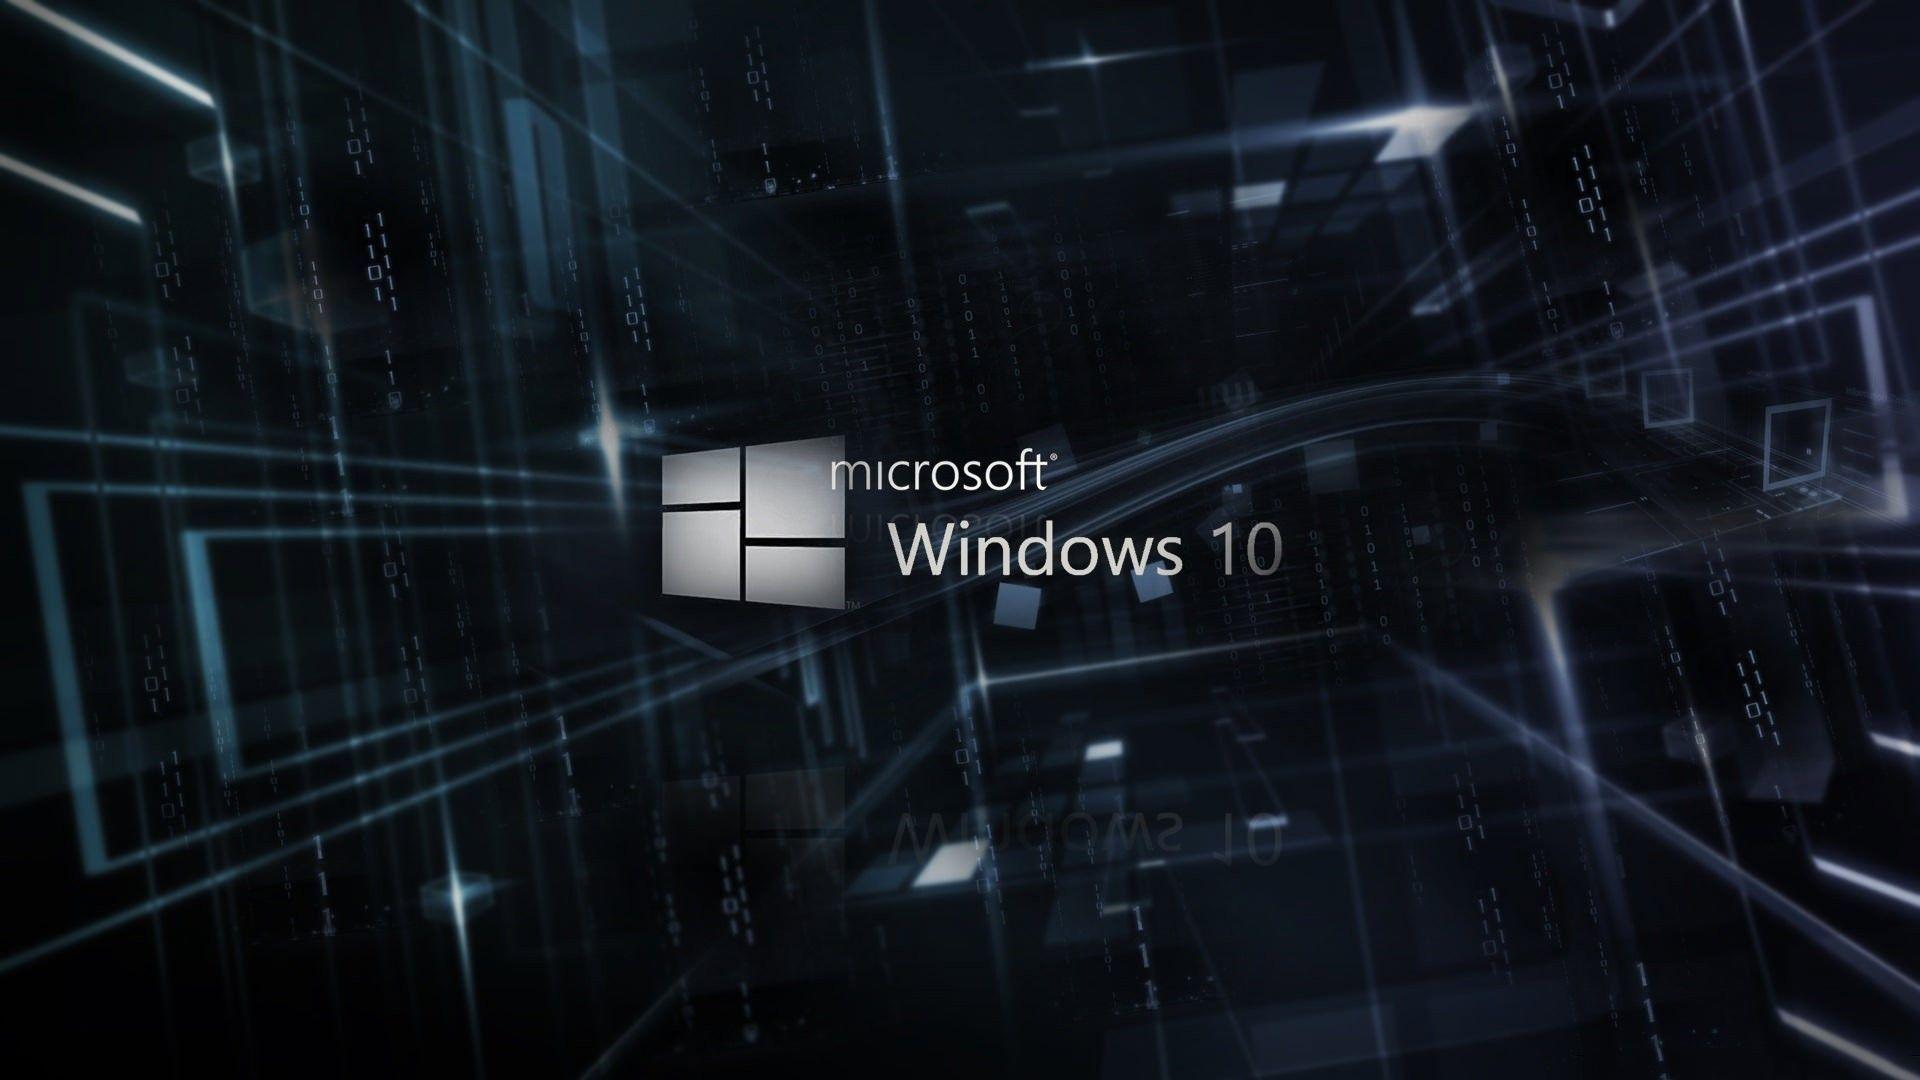 Trend Wallpaper Windows 10 Windows 10 Logo Windows Wallpaper